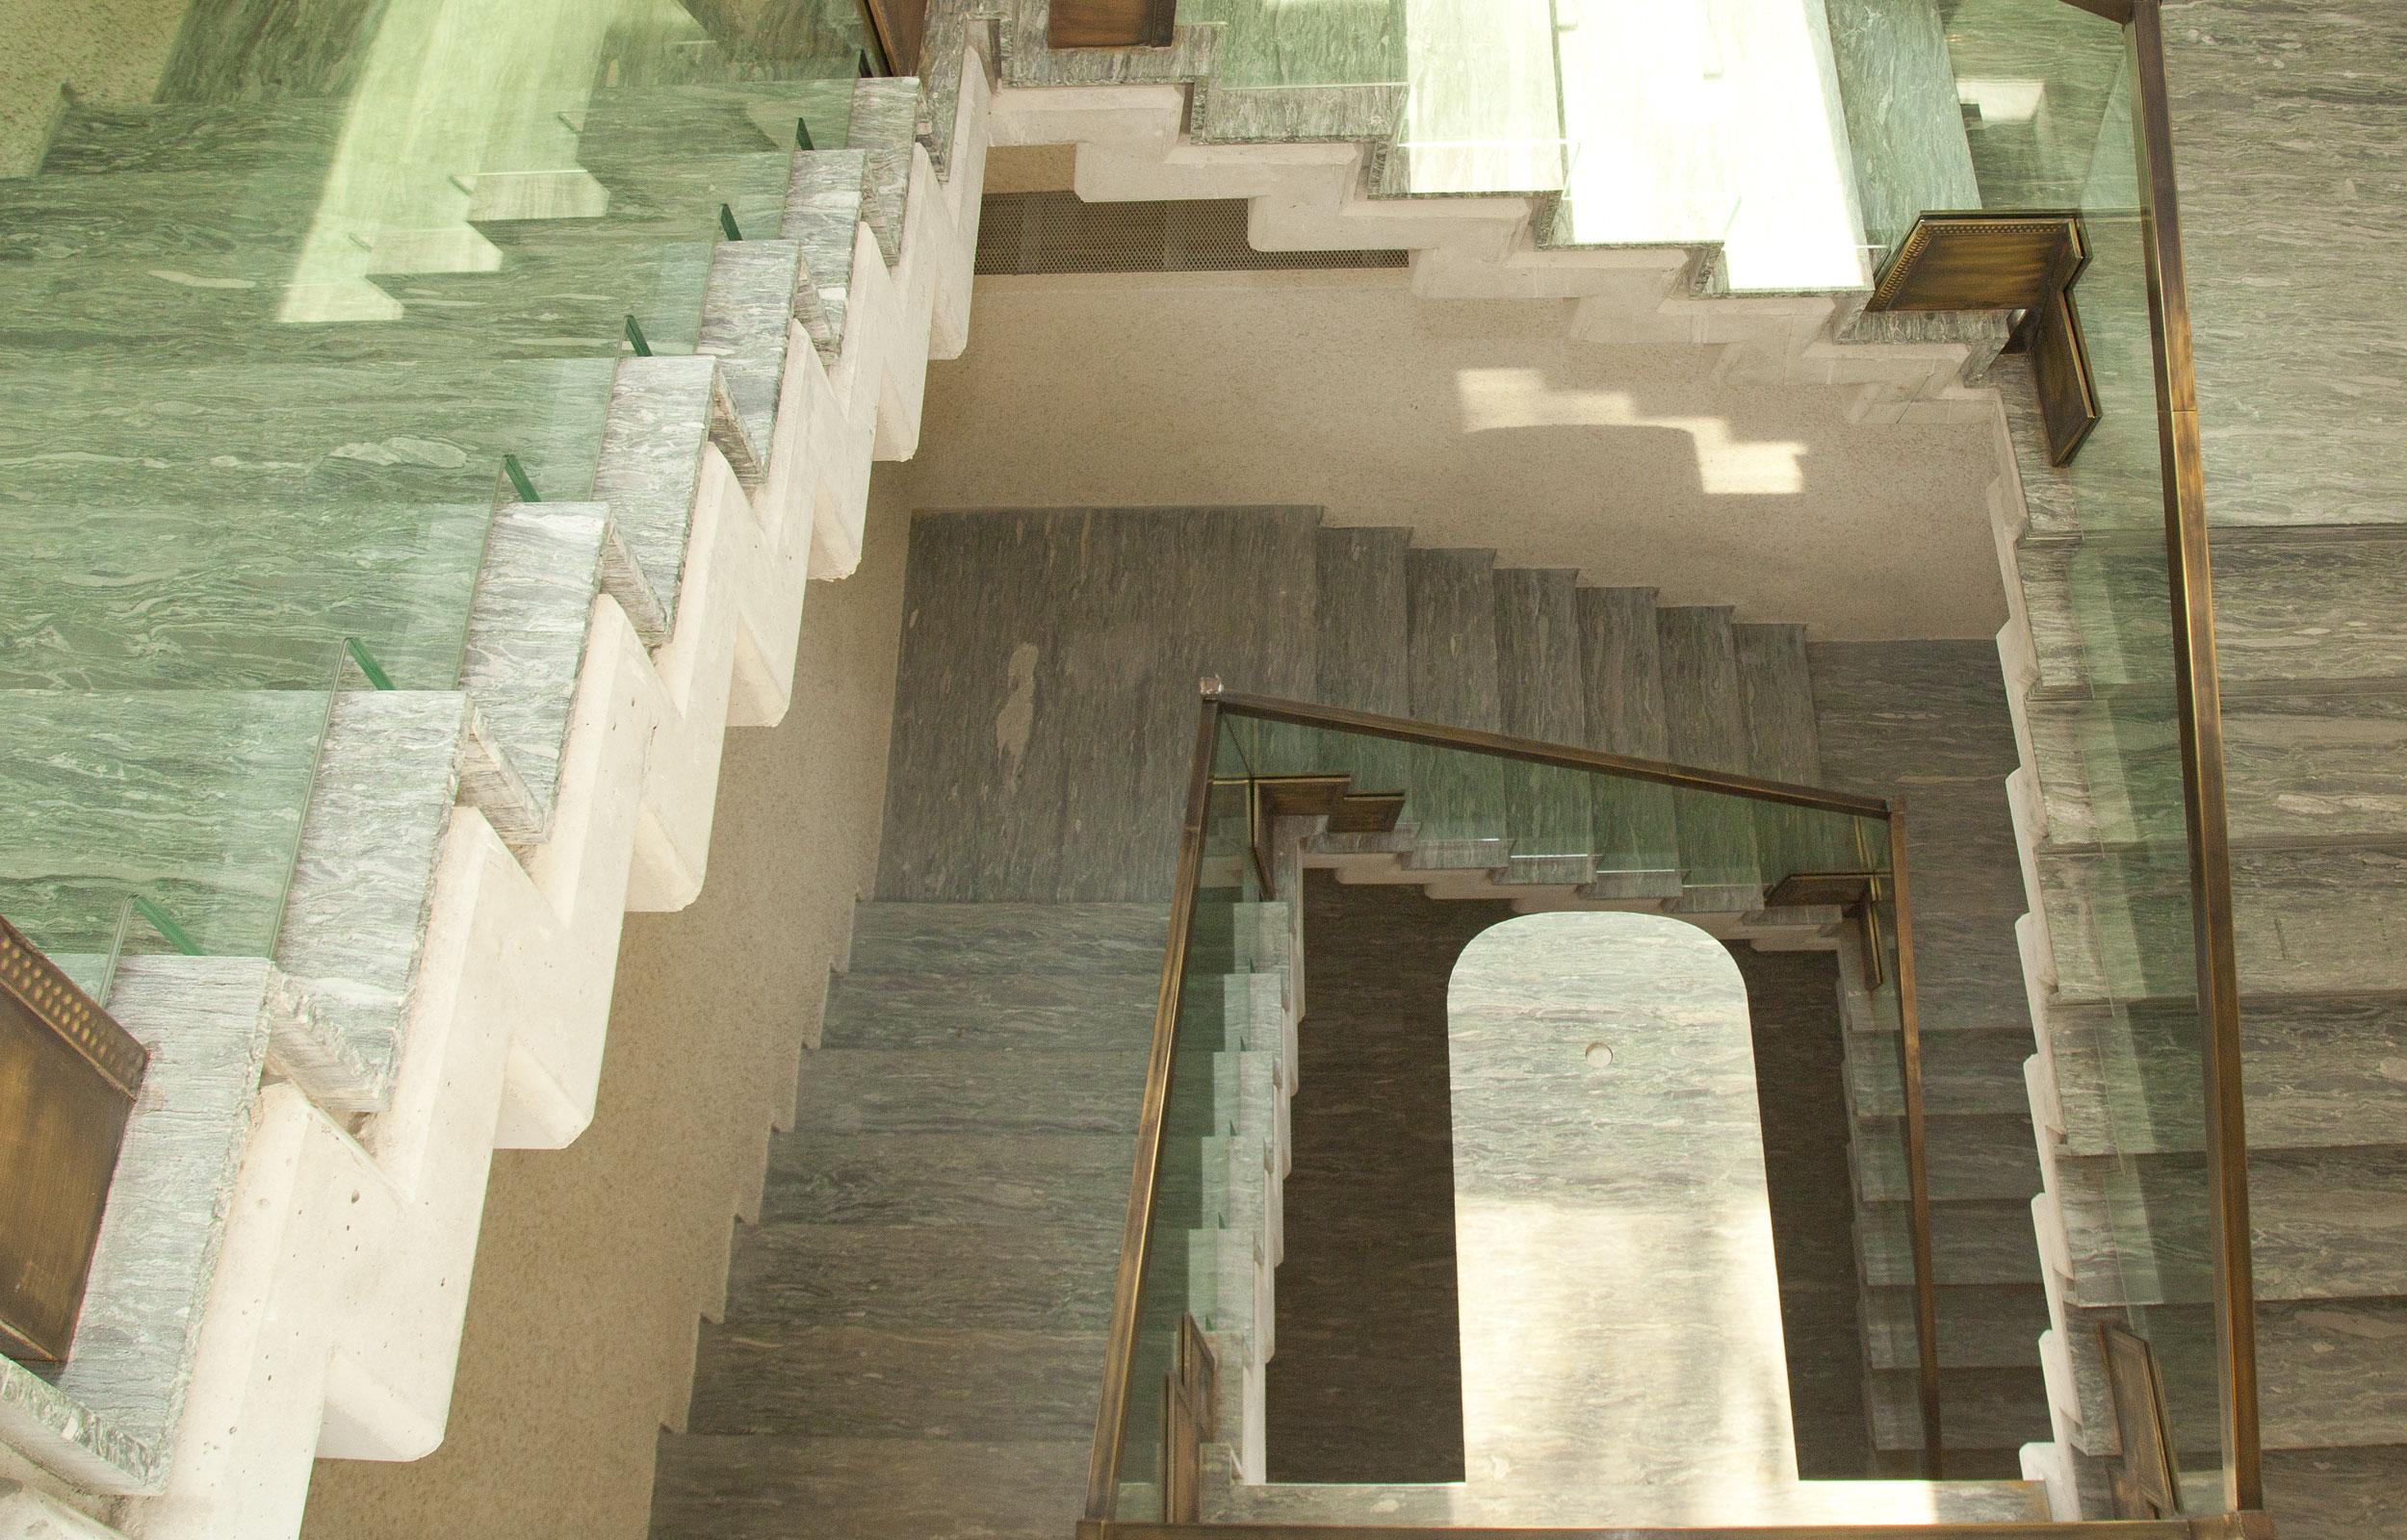 Scara interioara marmura balustrada sticla inox haute couture